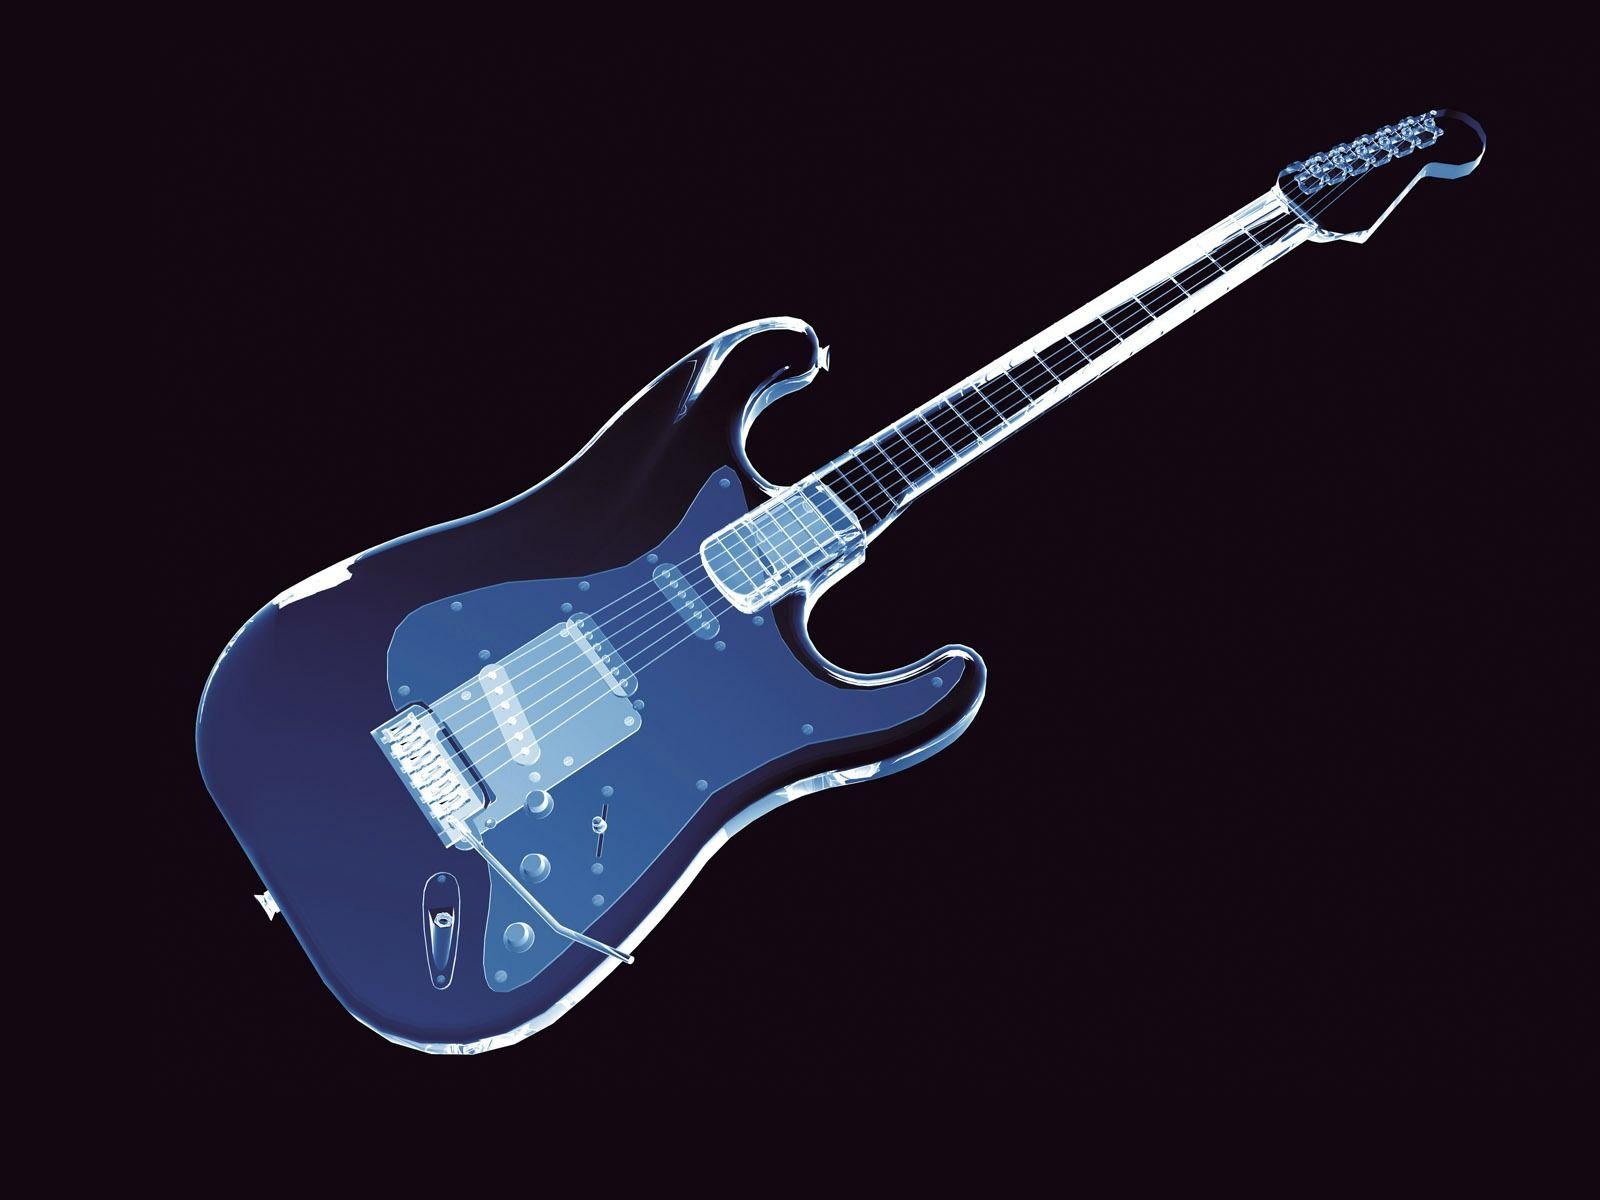 3d Wallpaper Digital 3d Wallpapers Guitar Wallpaper 1600x1200 147 Kb The Art Of Electronics Black Acoustic Guitar Free Wallpaper